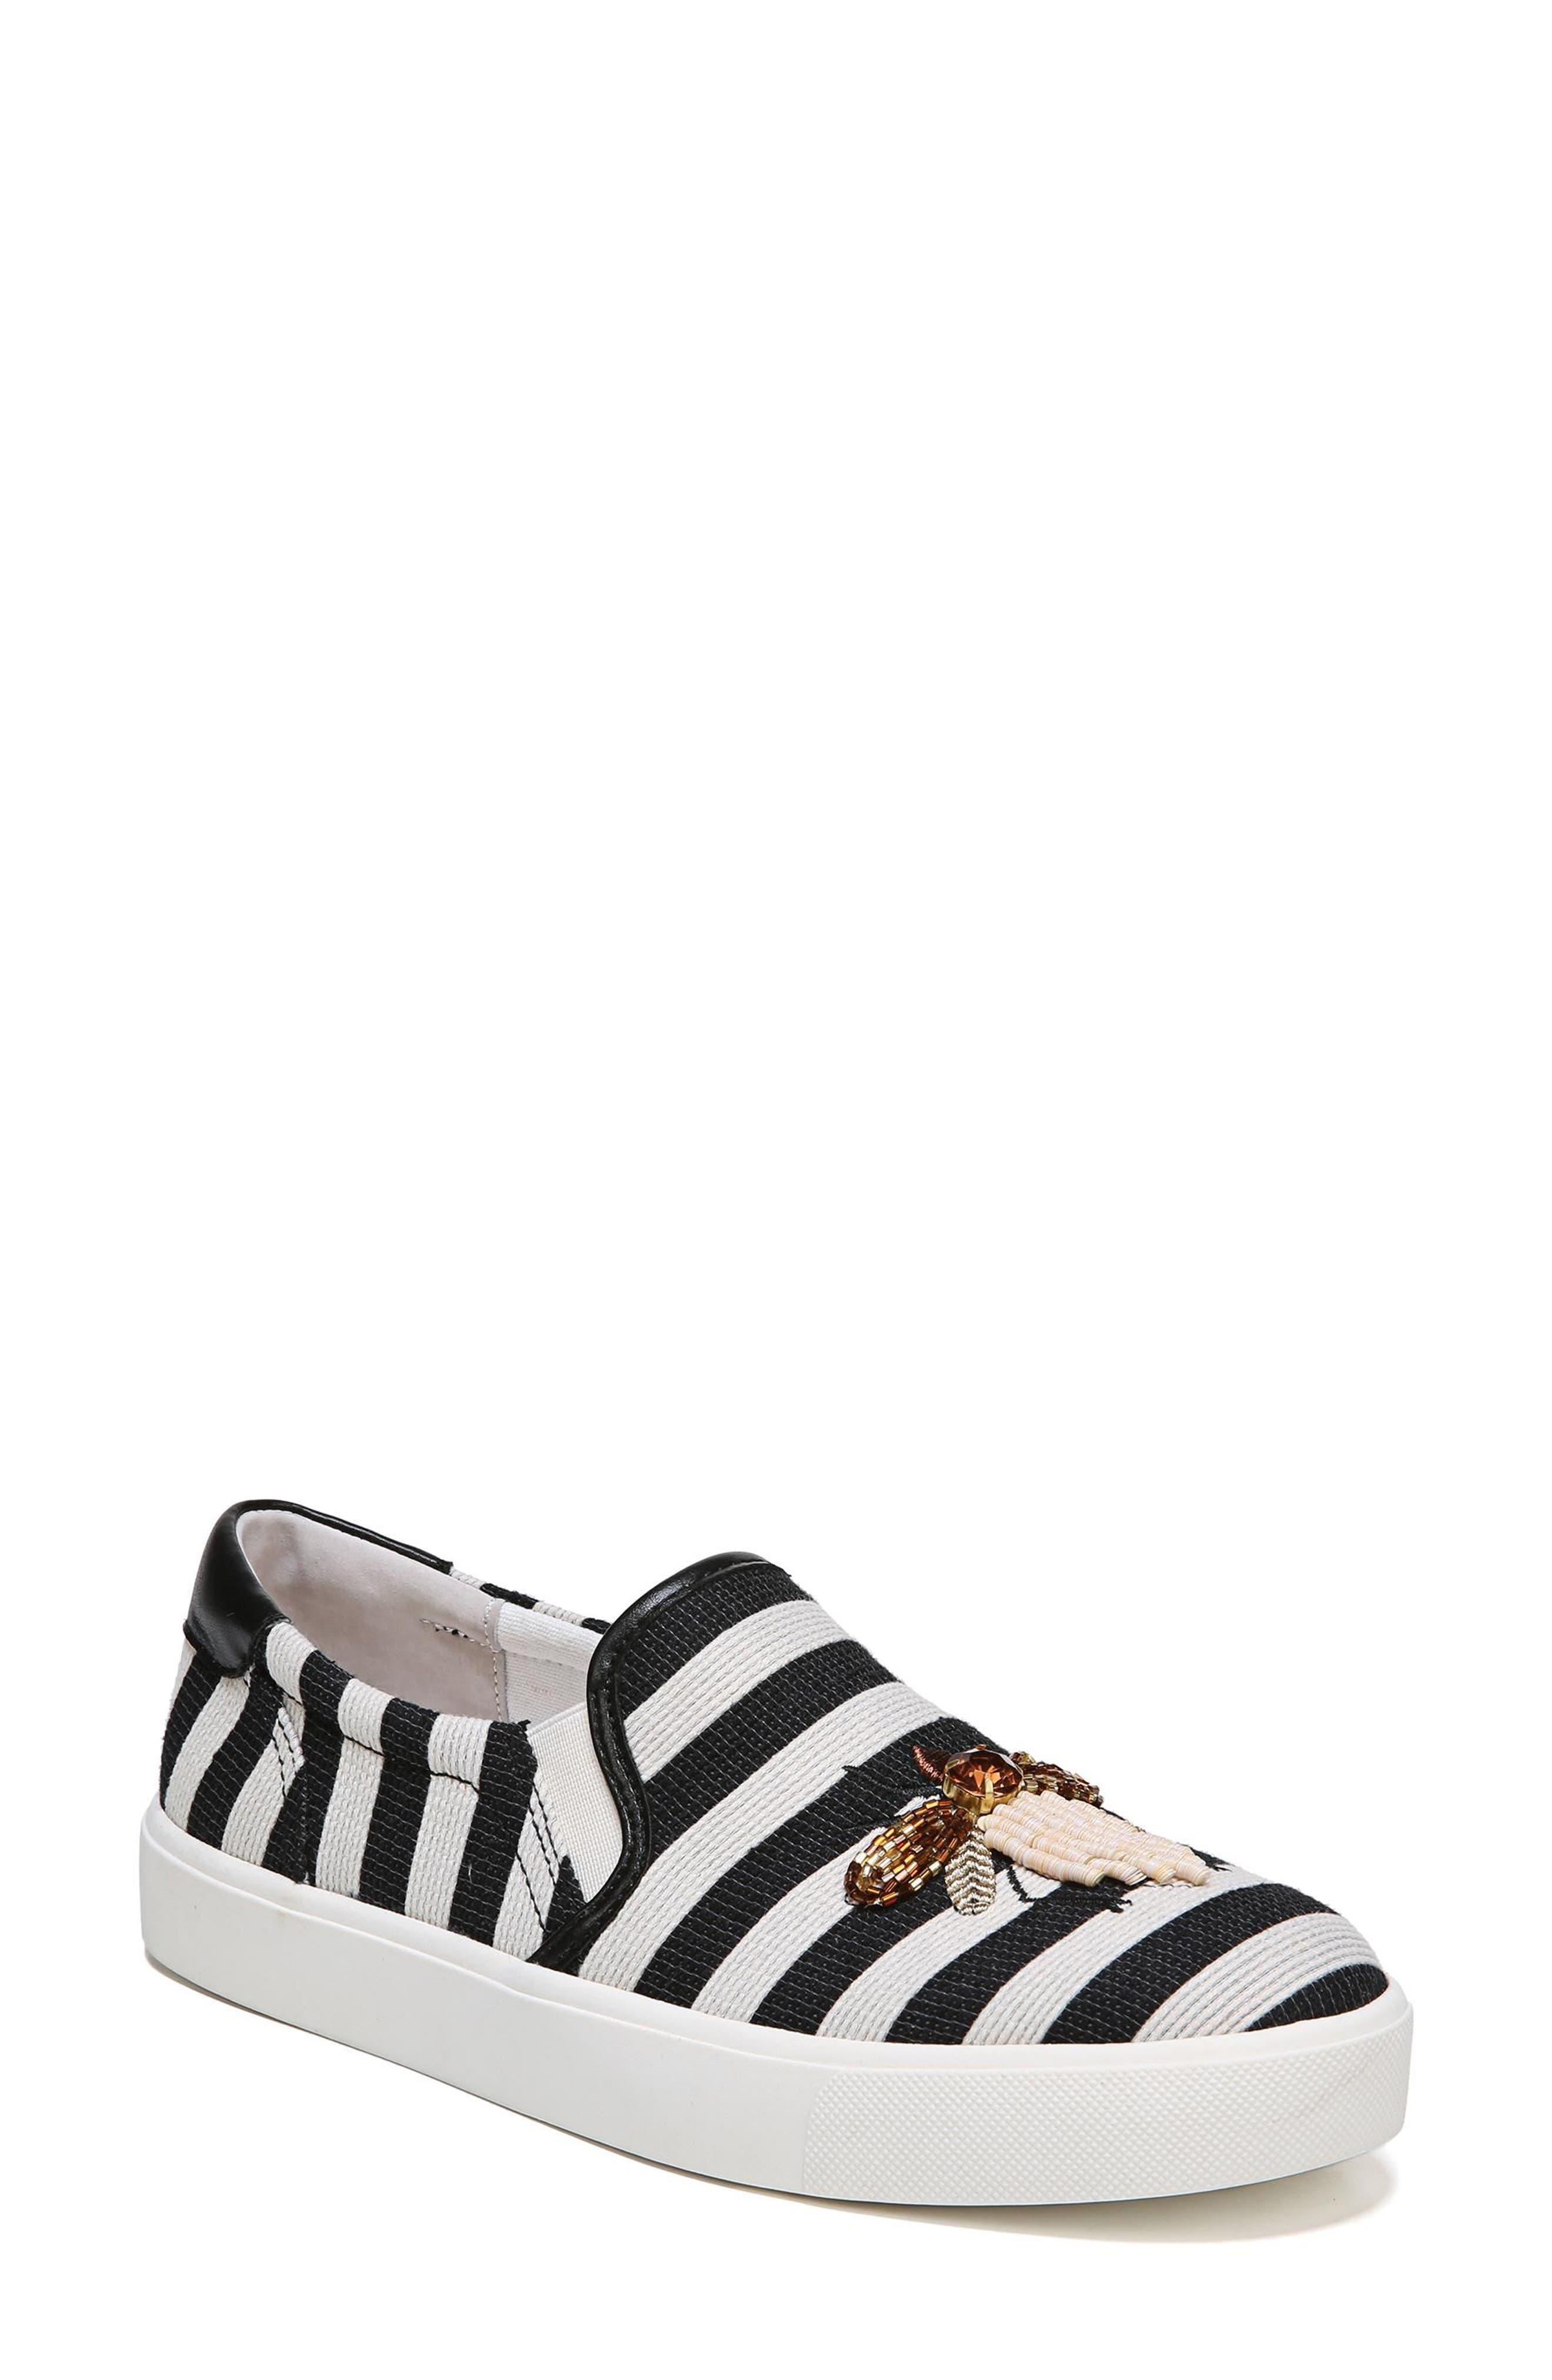 Evelina Slip-On,                         Main,                         color, Black Stripe Nappa Leather